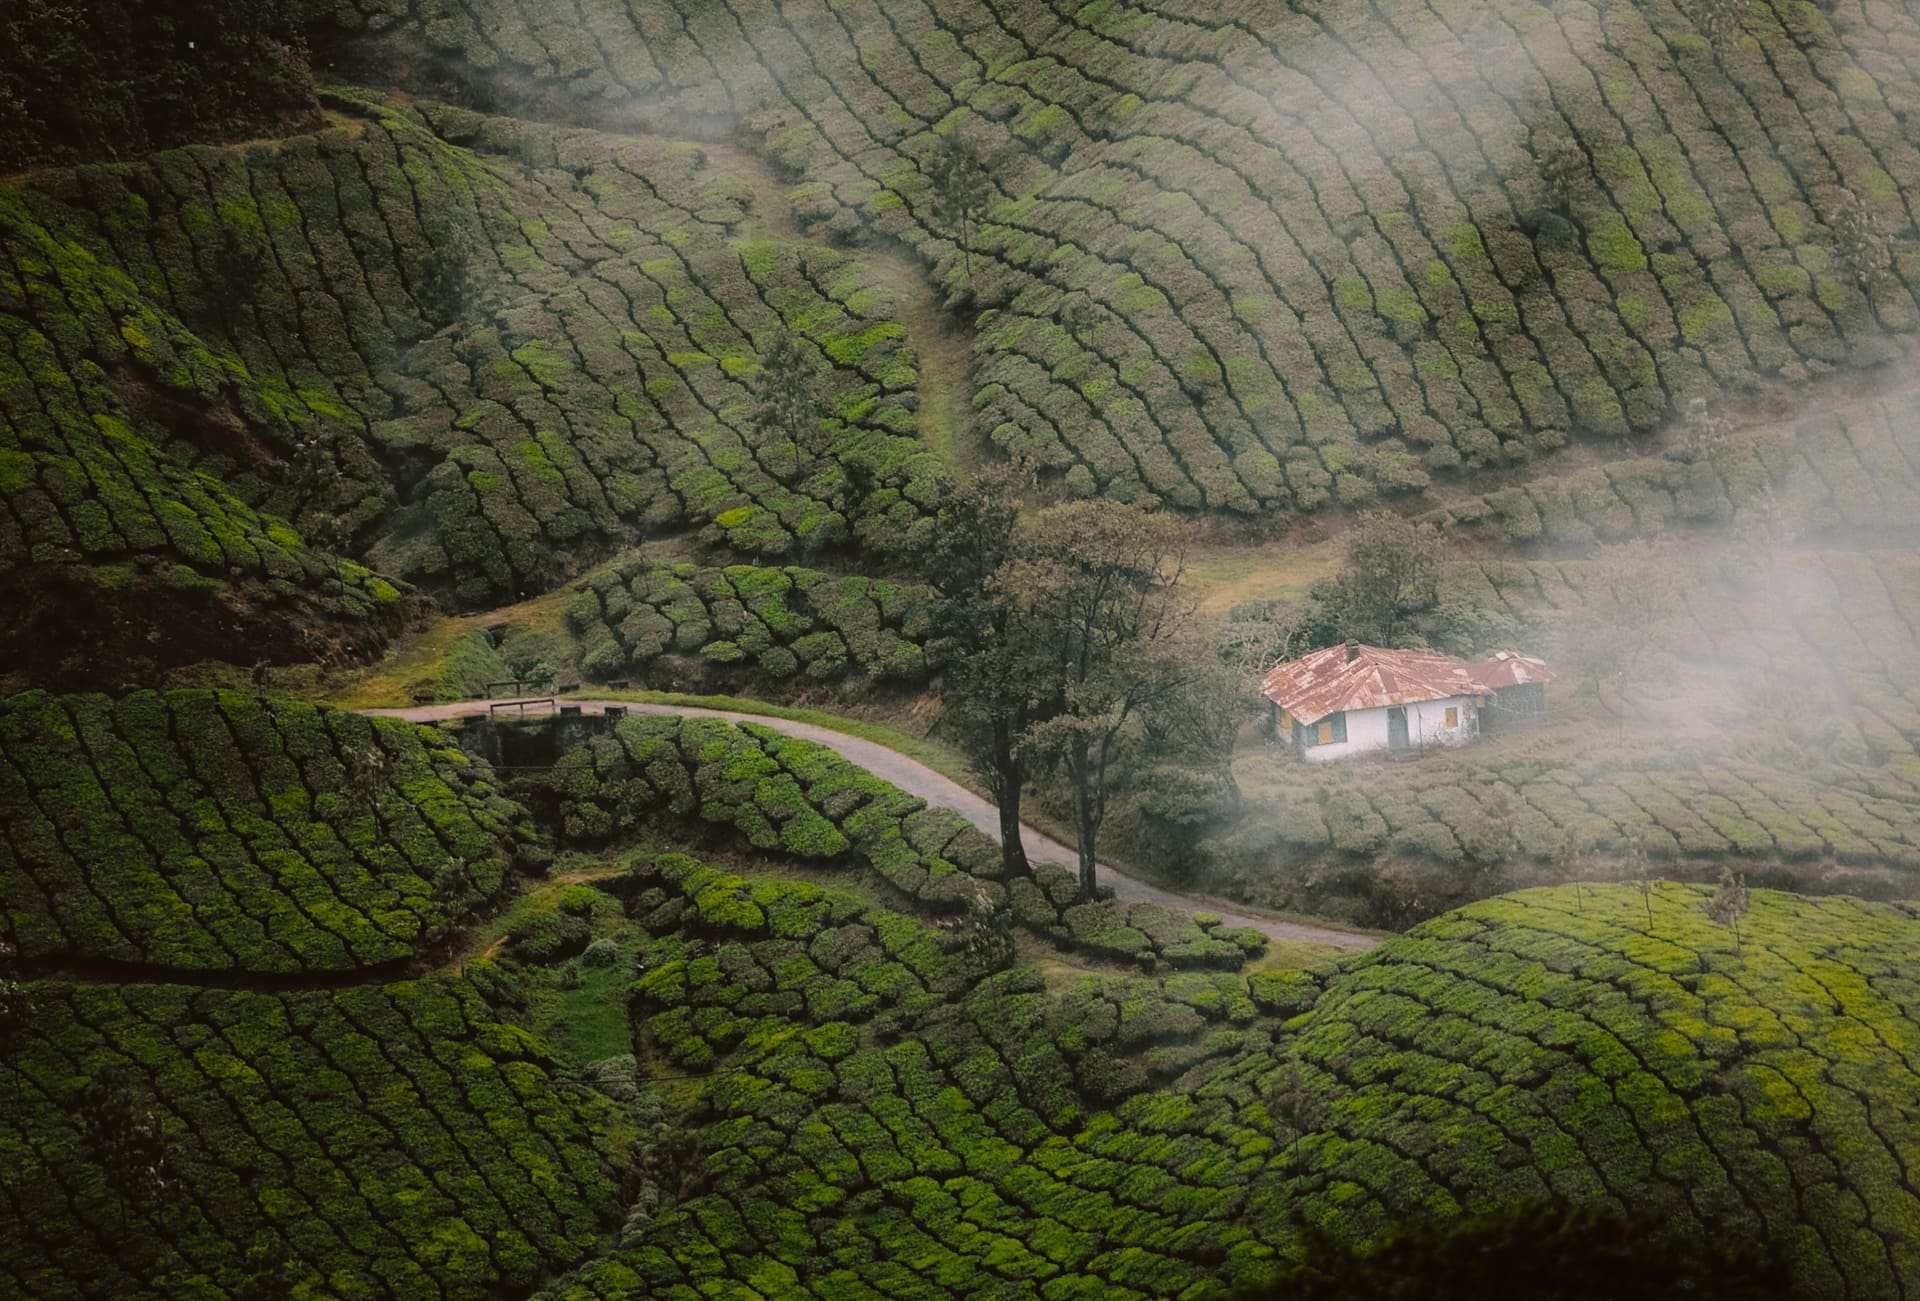 kerala india tea plantation